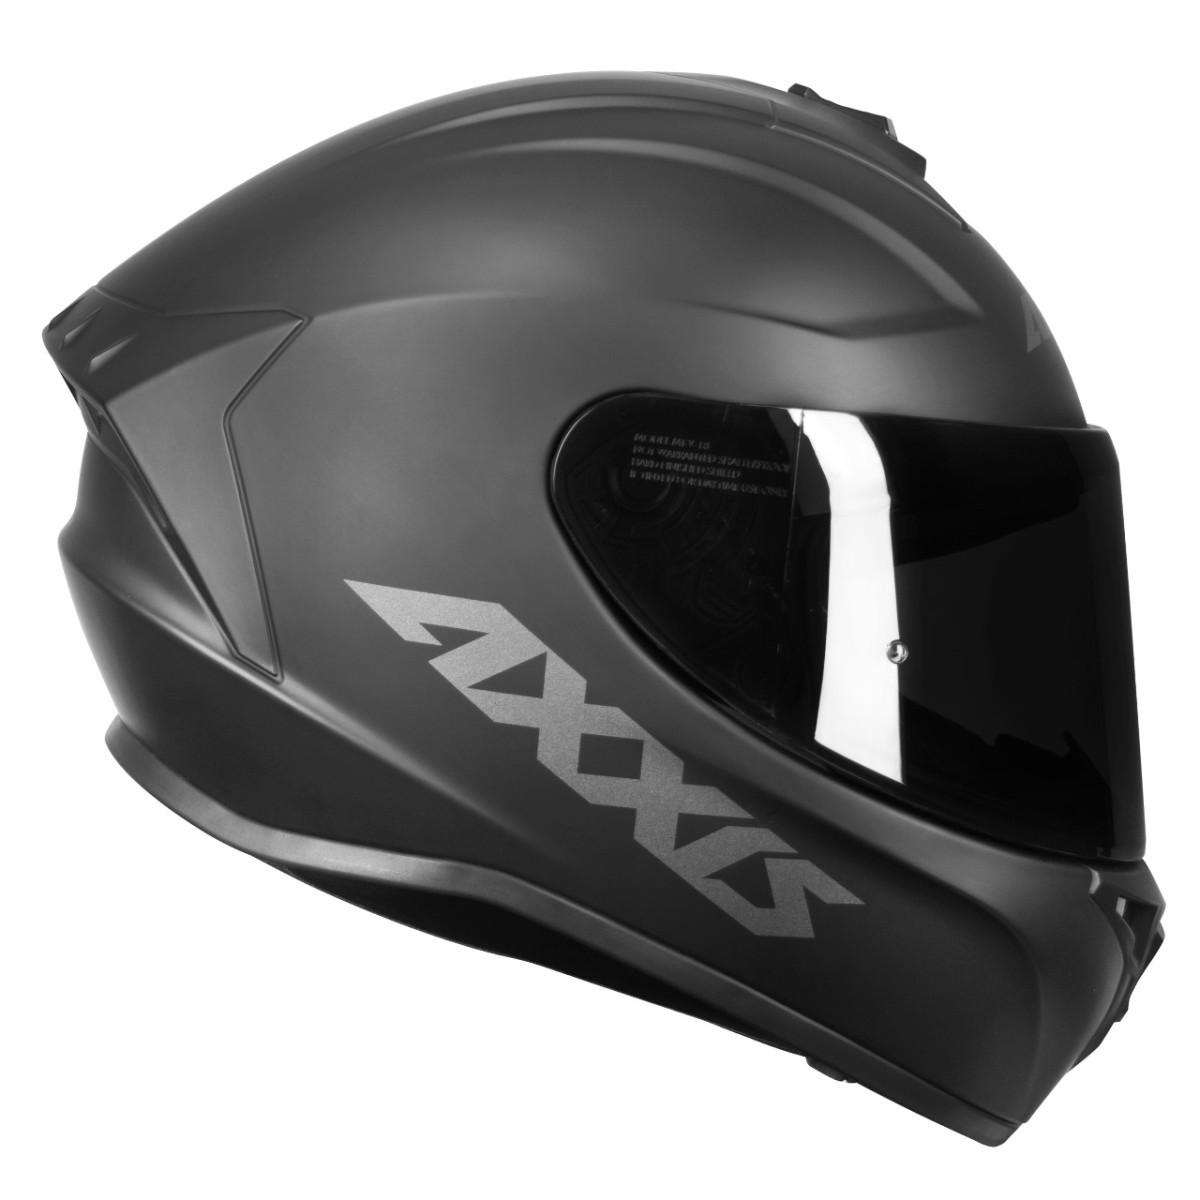 CAPACETE MOTOCICLISTA MOTO AXXIS DRAKEN SOLID/MONO PRETO FOSCO